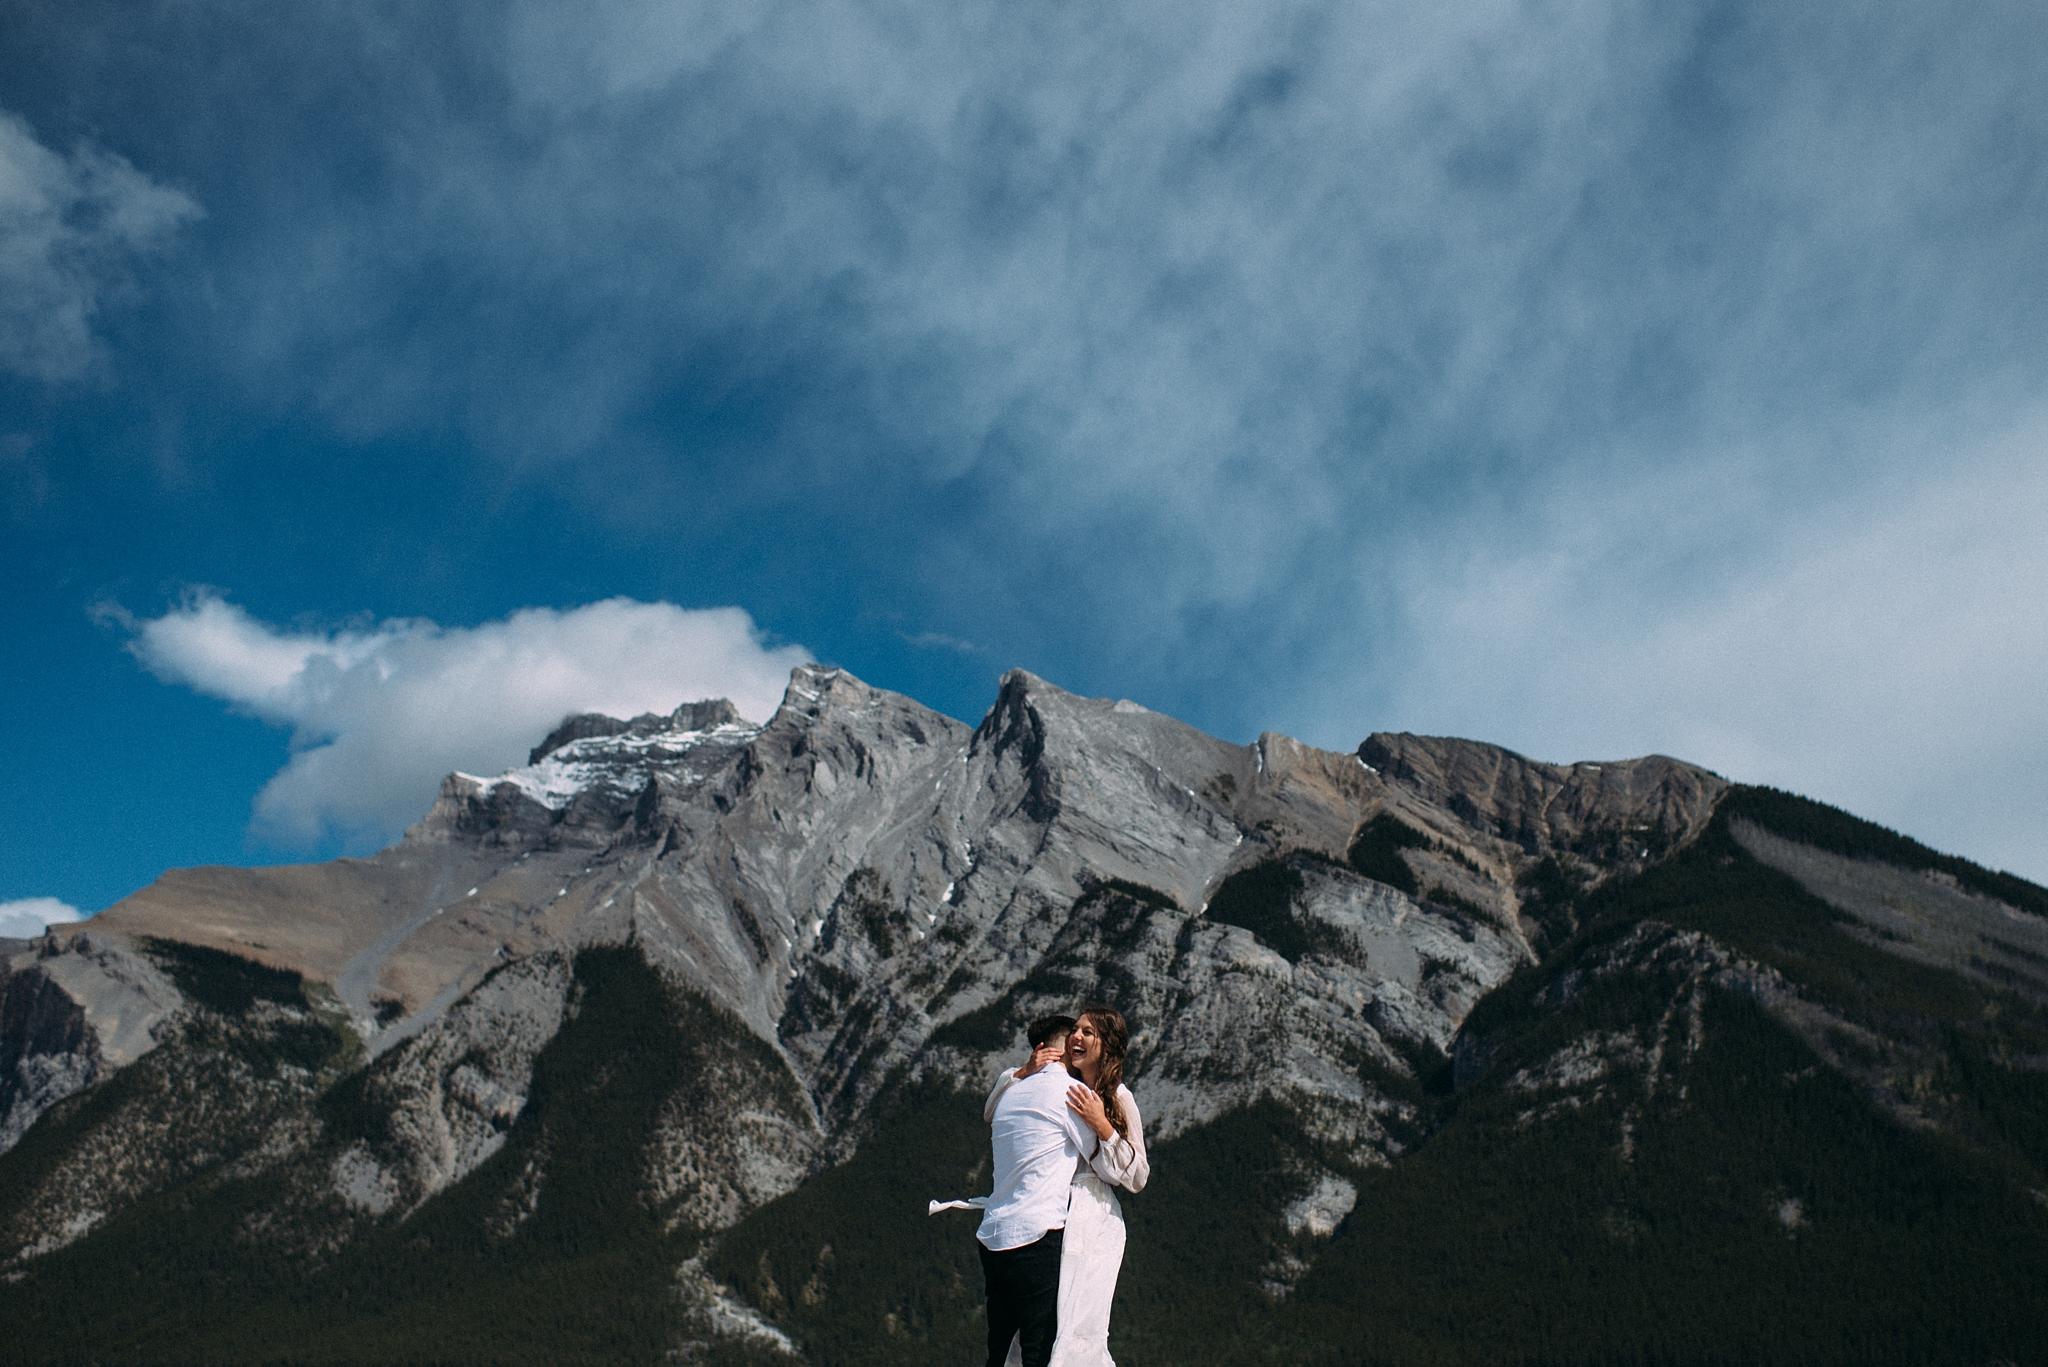 kaihla_tonai_intimate_wedding_elopement_photographer_4108